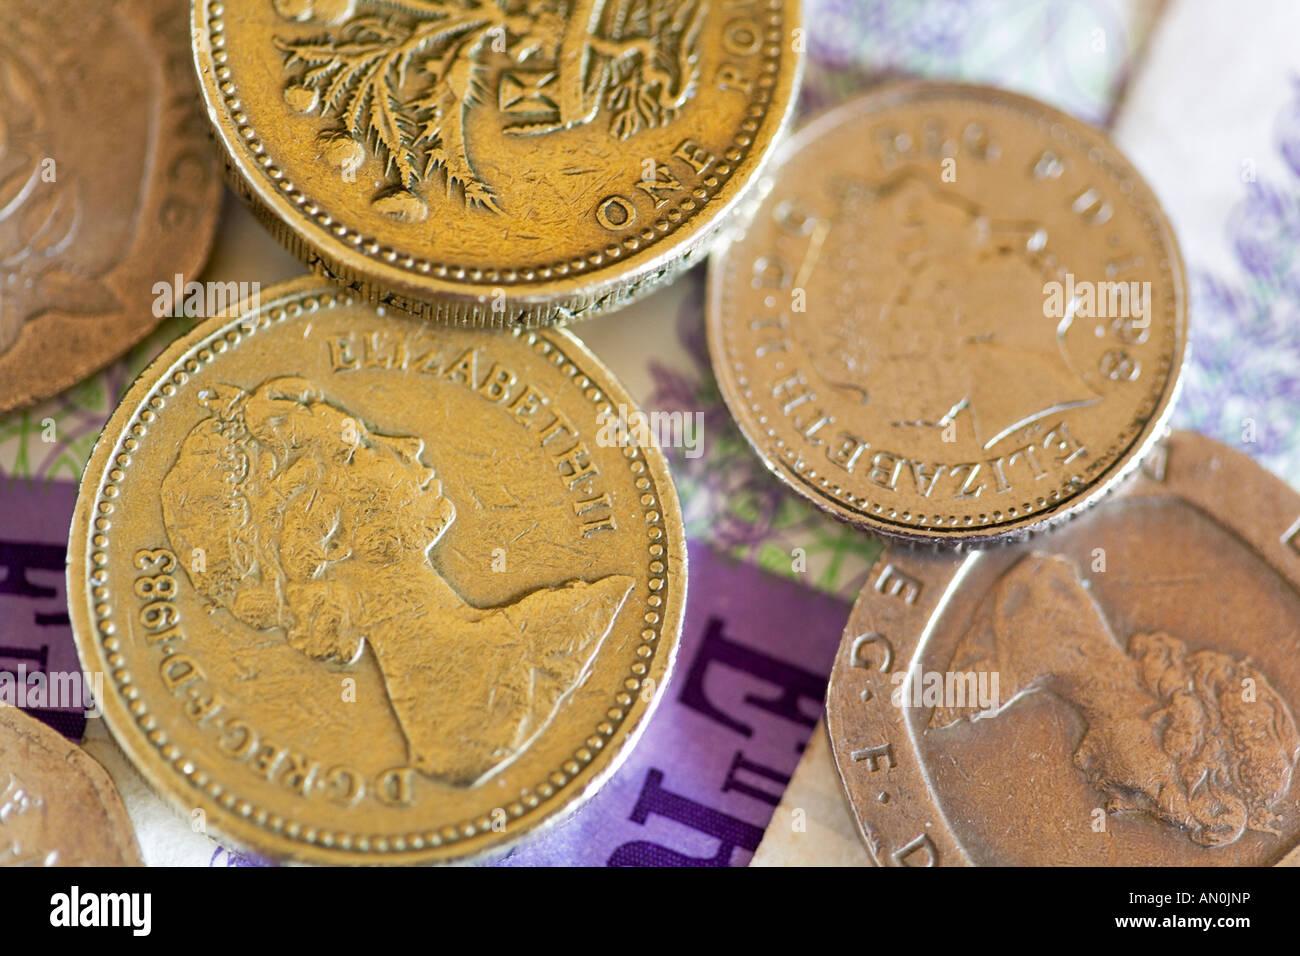 Assortment of English coins on Twenty pound notes - Stock Image